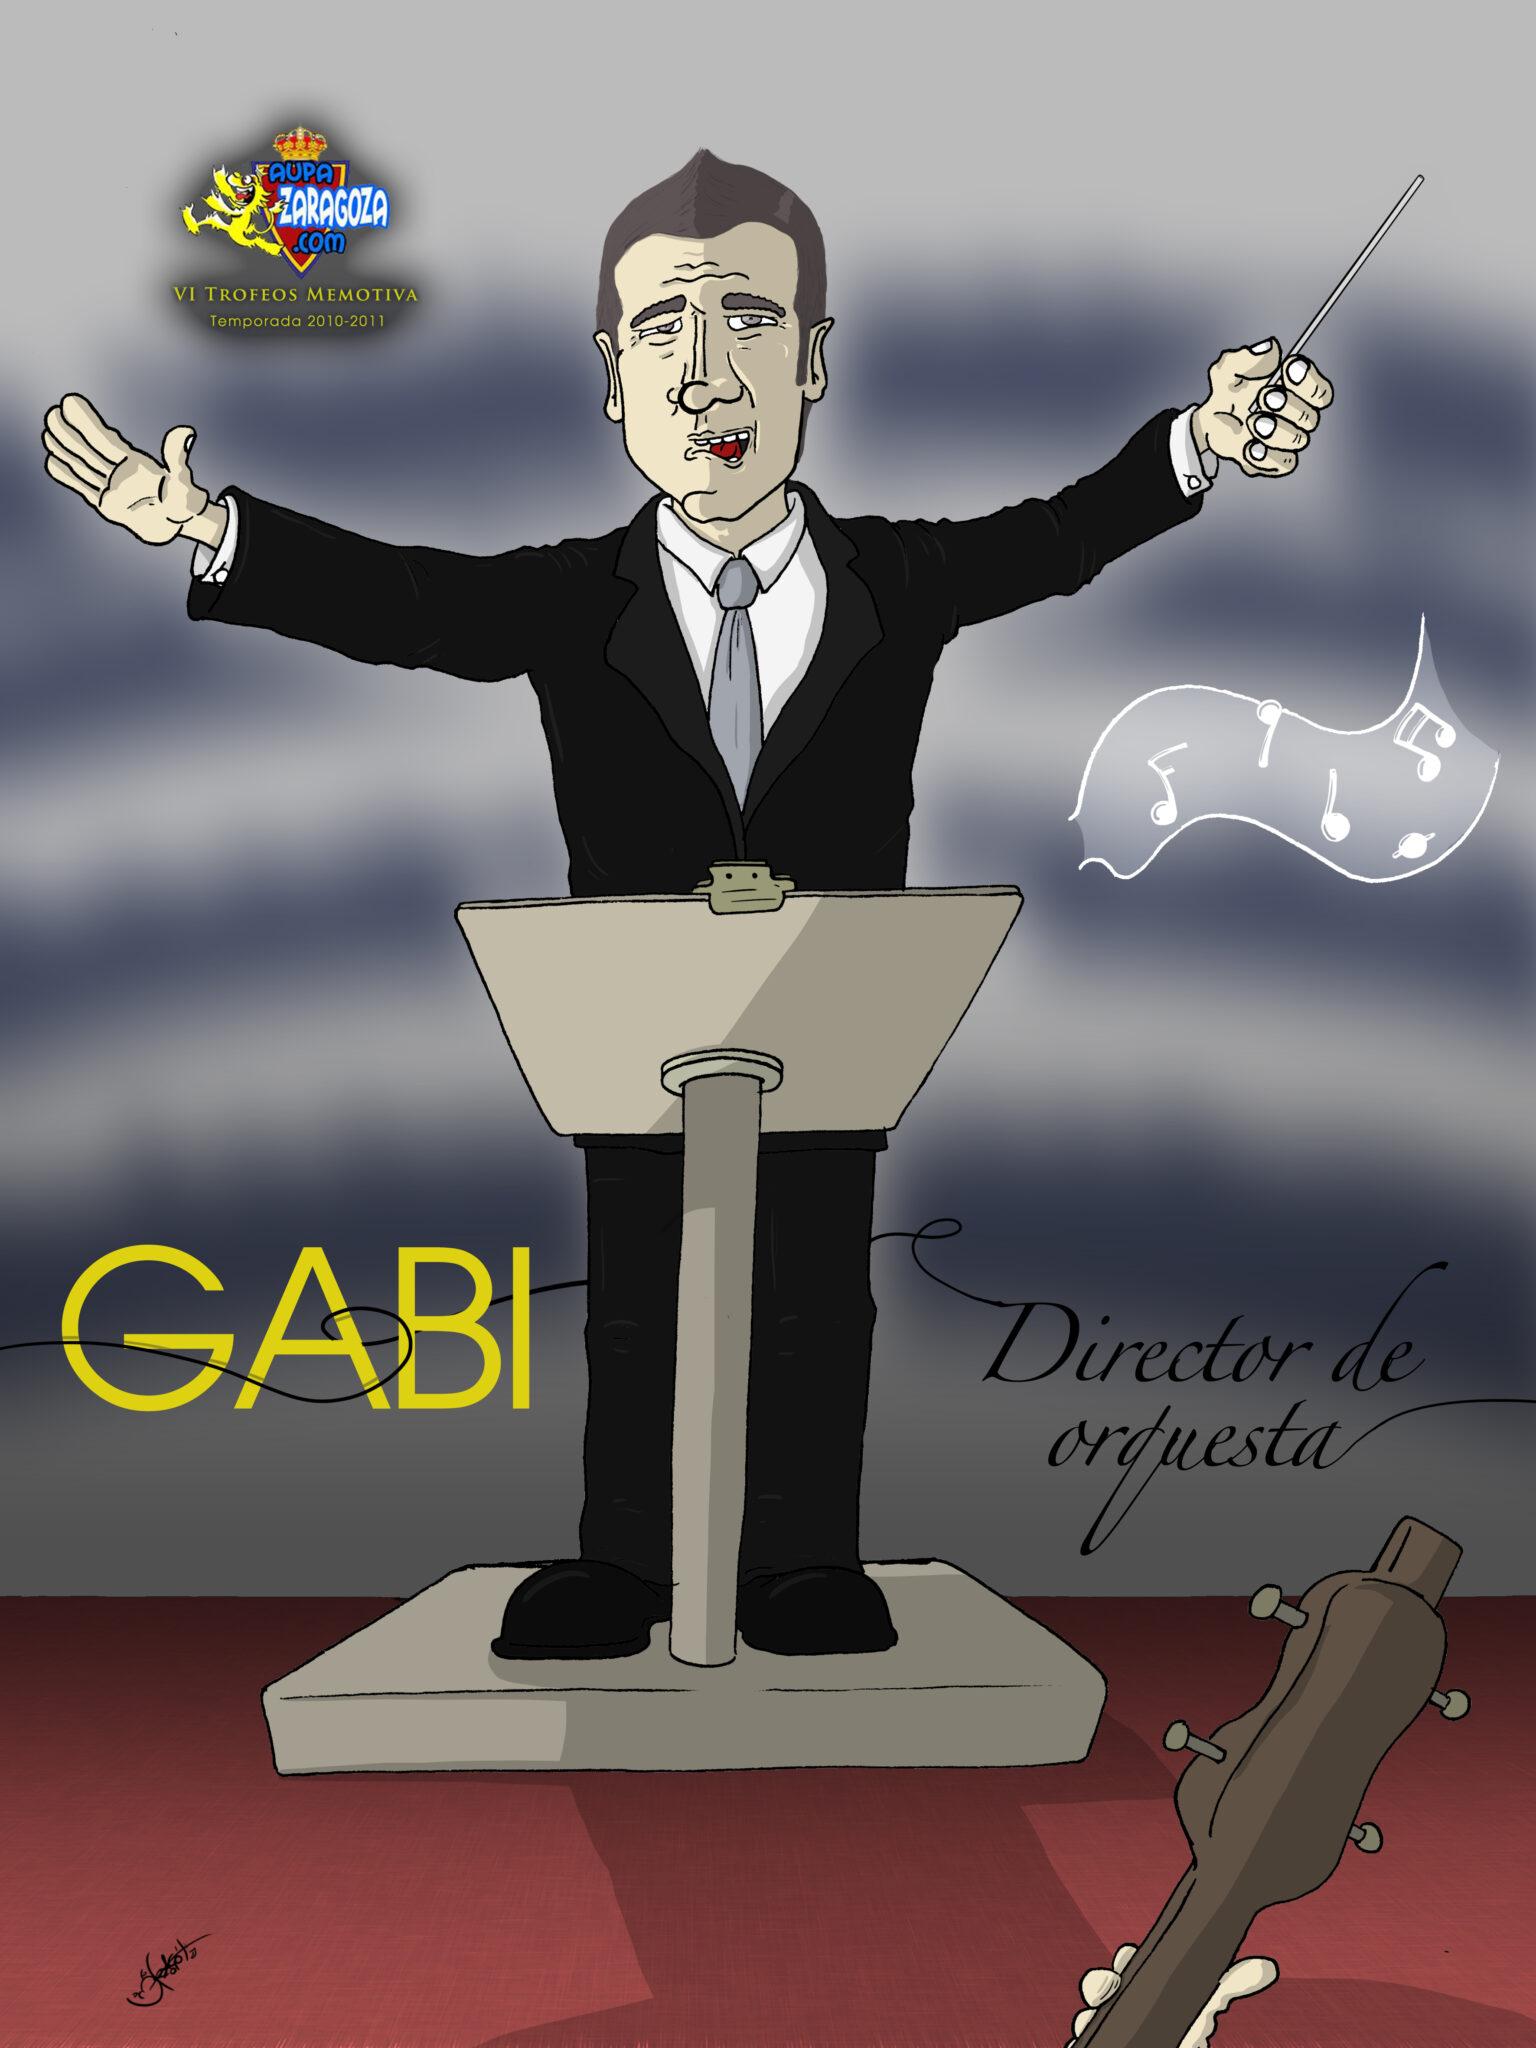 GABI.VI.MEMOTIVA